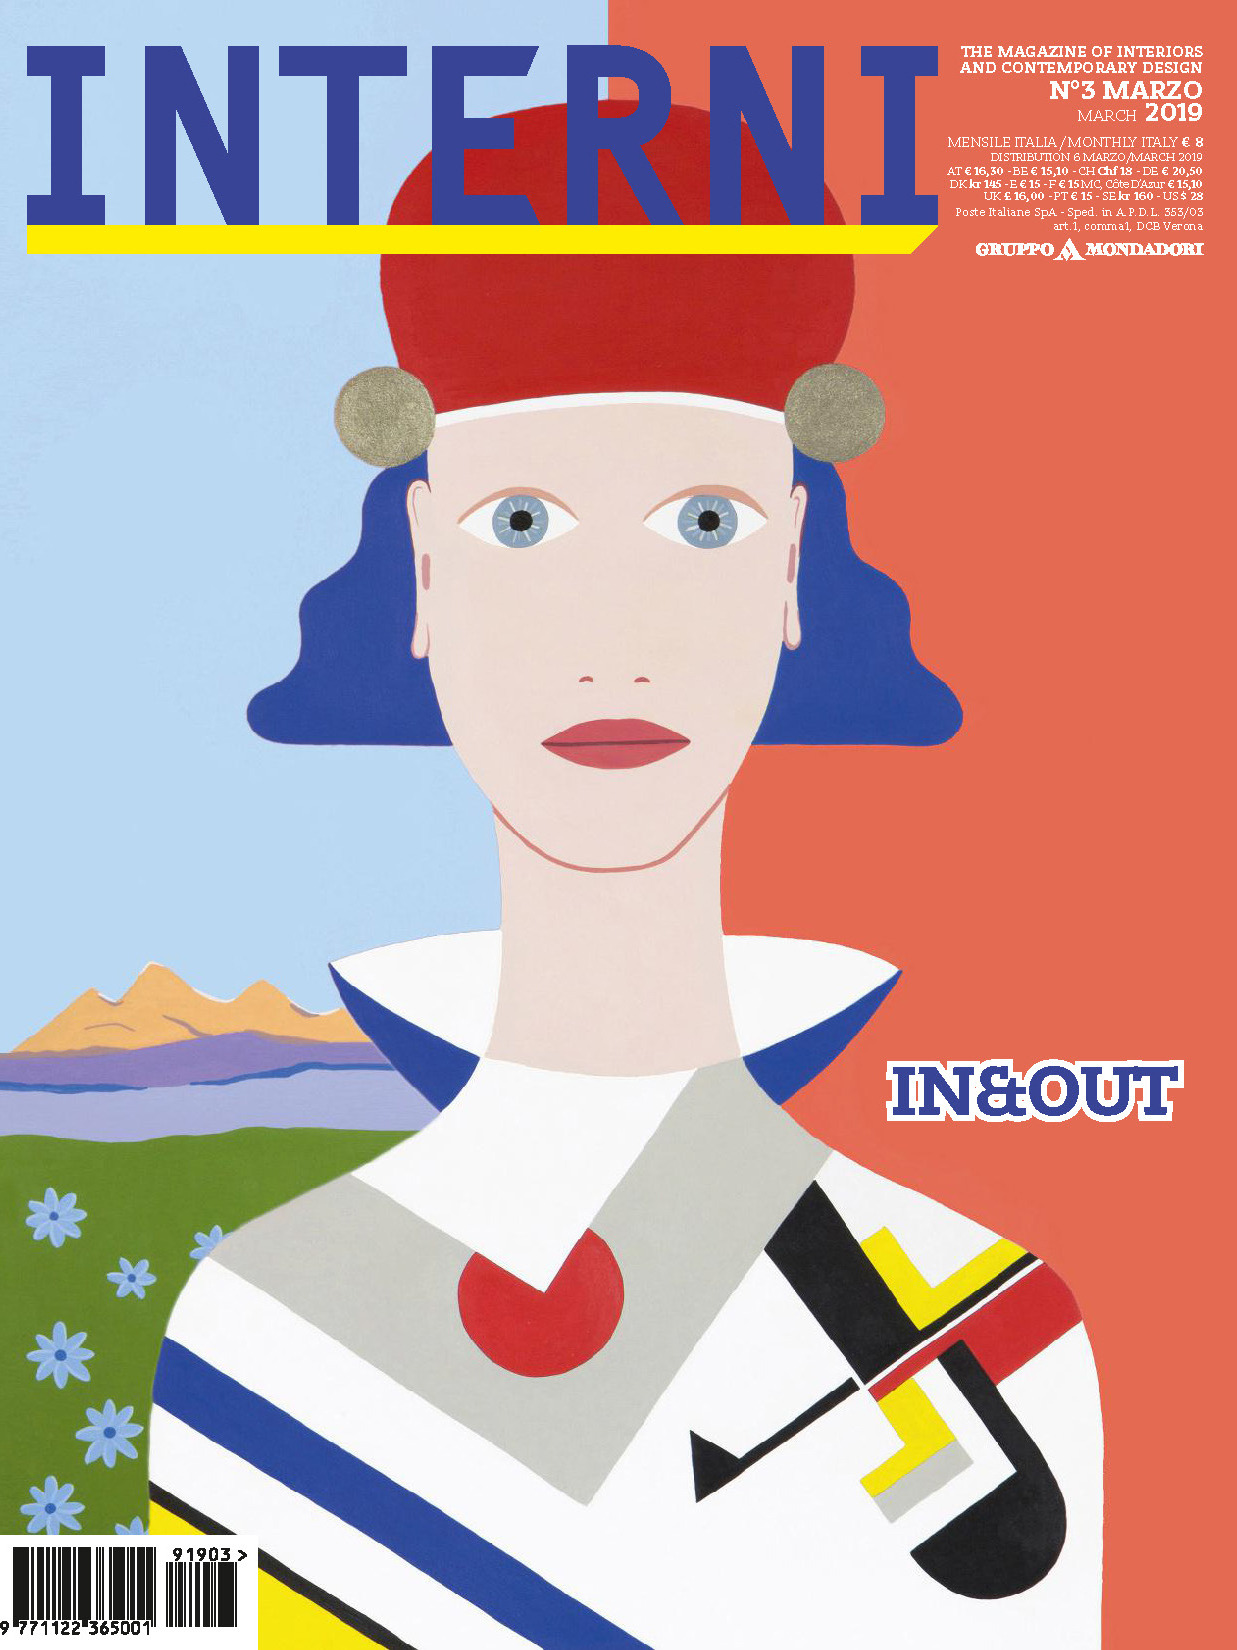 《Interni》意大利室内设计杂志2019年03月号